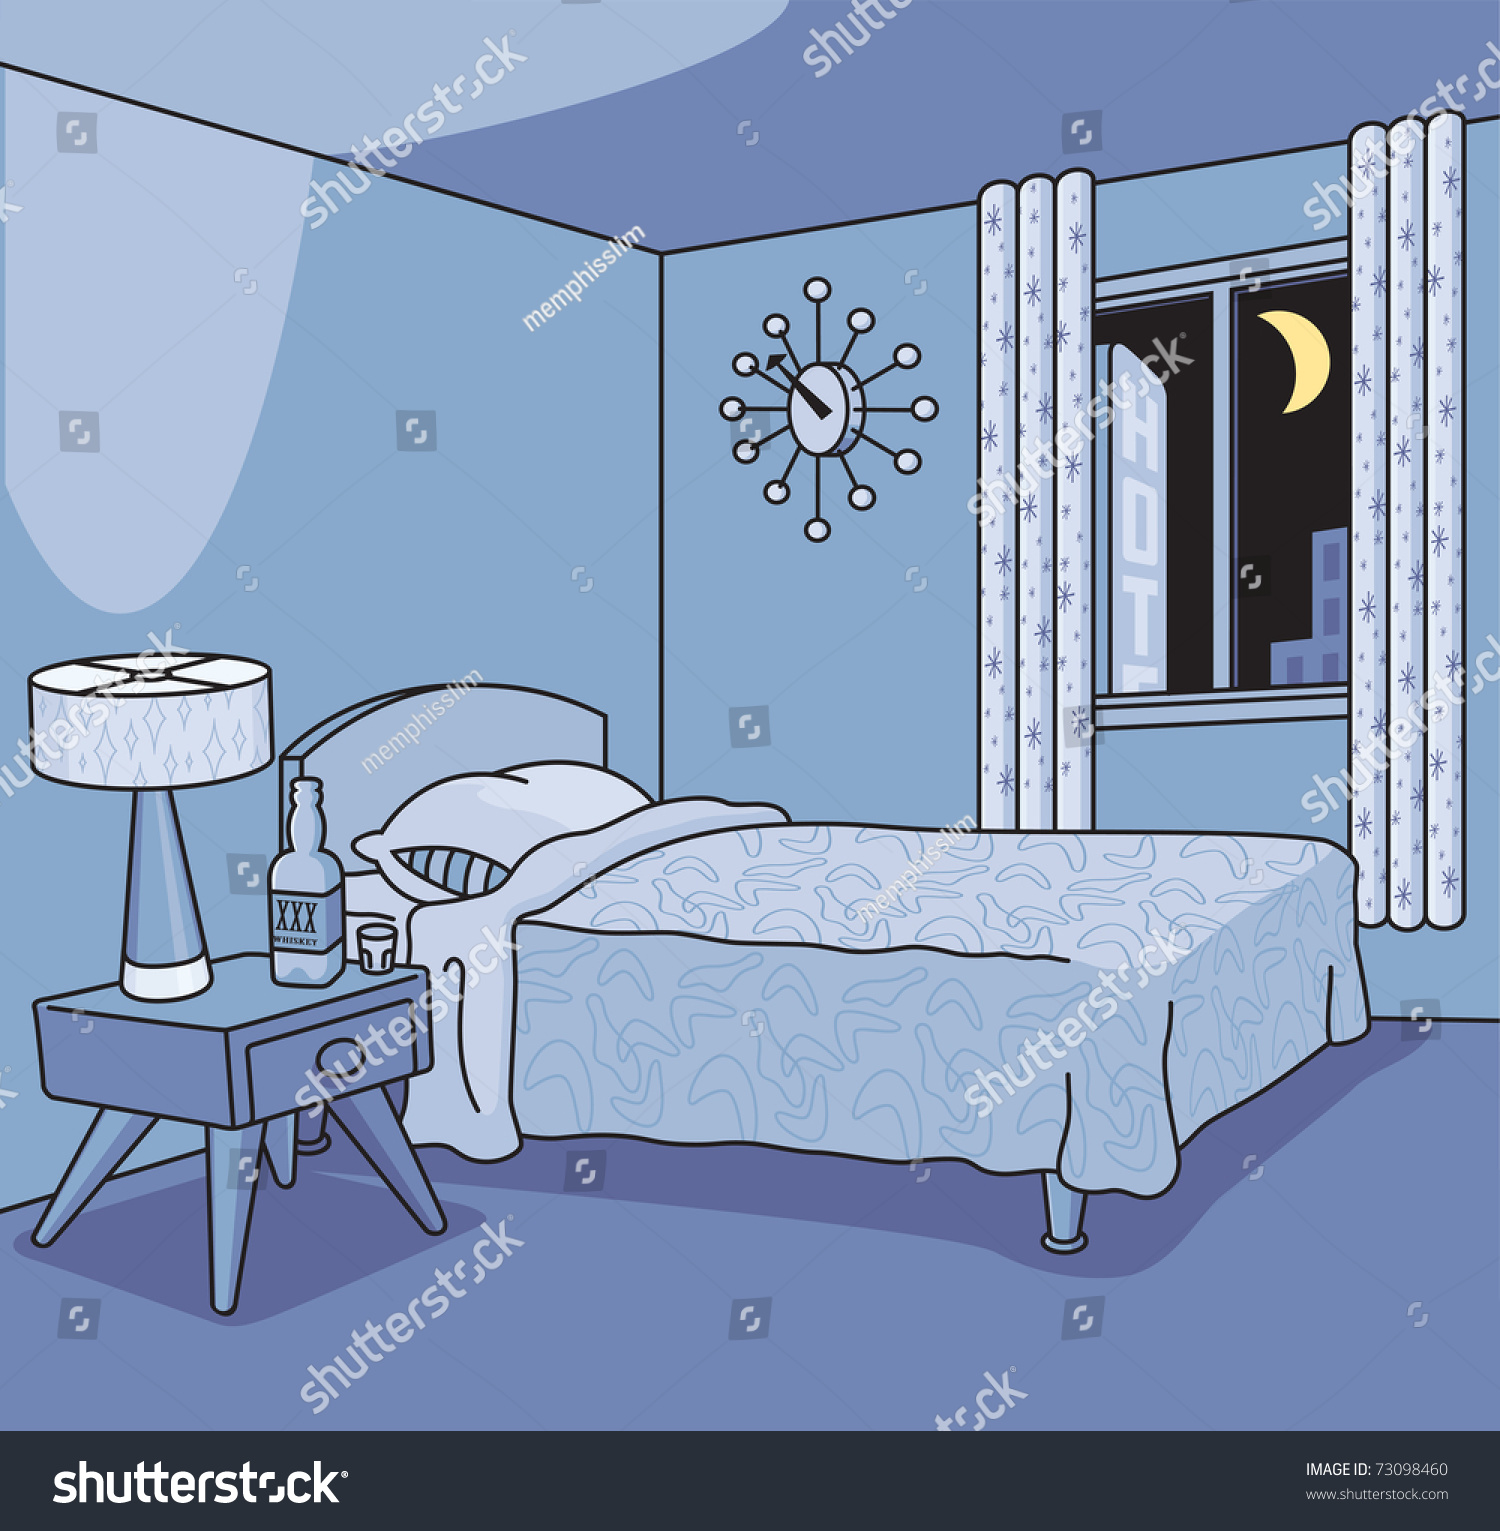 Bed Clip Art Single